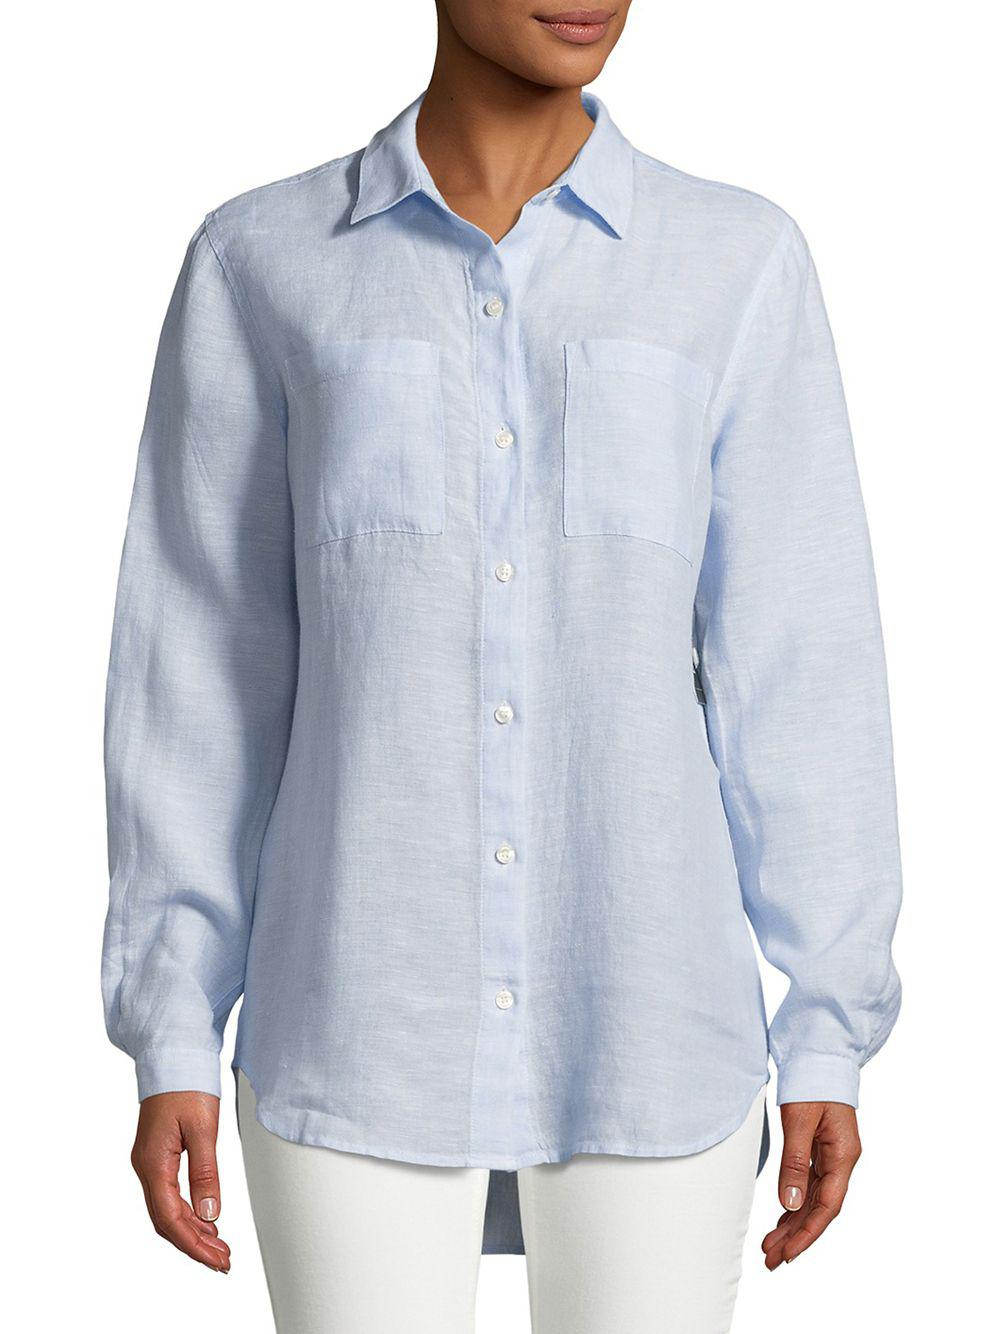 8d6a53622747e Lord   Taylor. Women s Blue Petite Tiffany Crinkle Linen Button-down Shirt